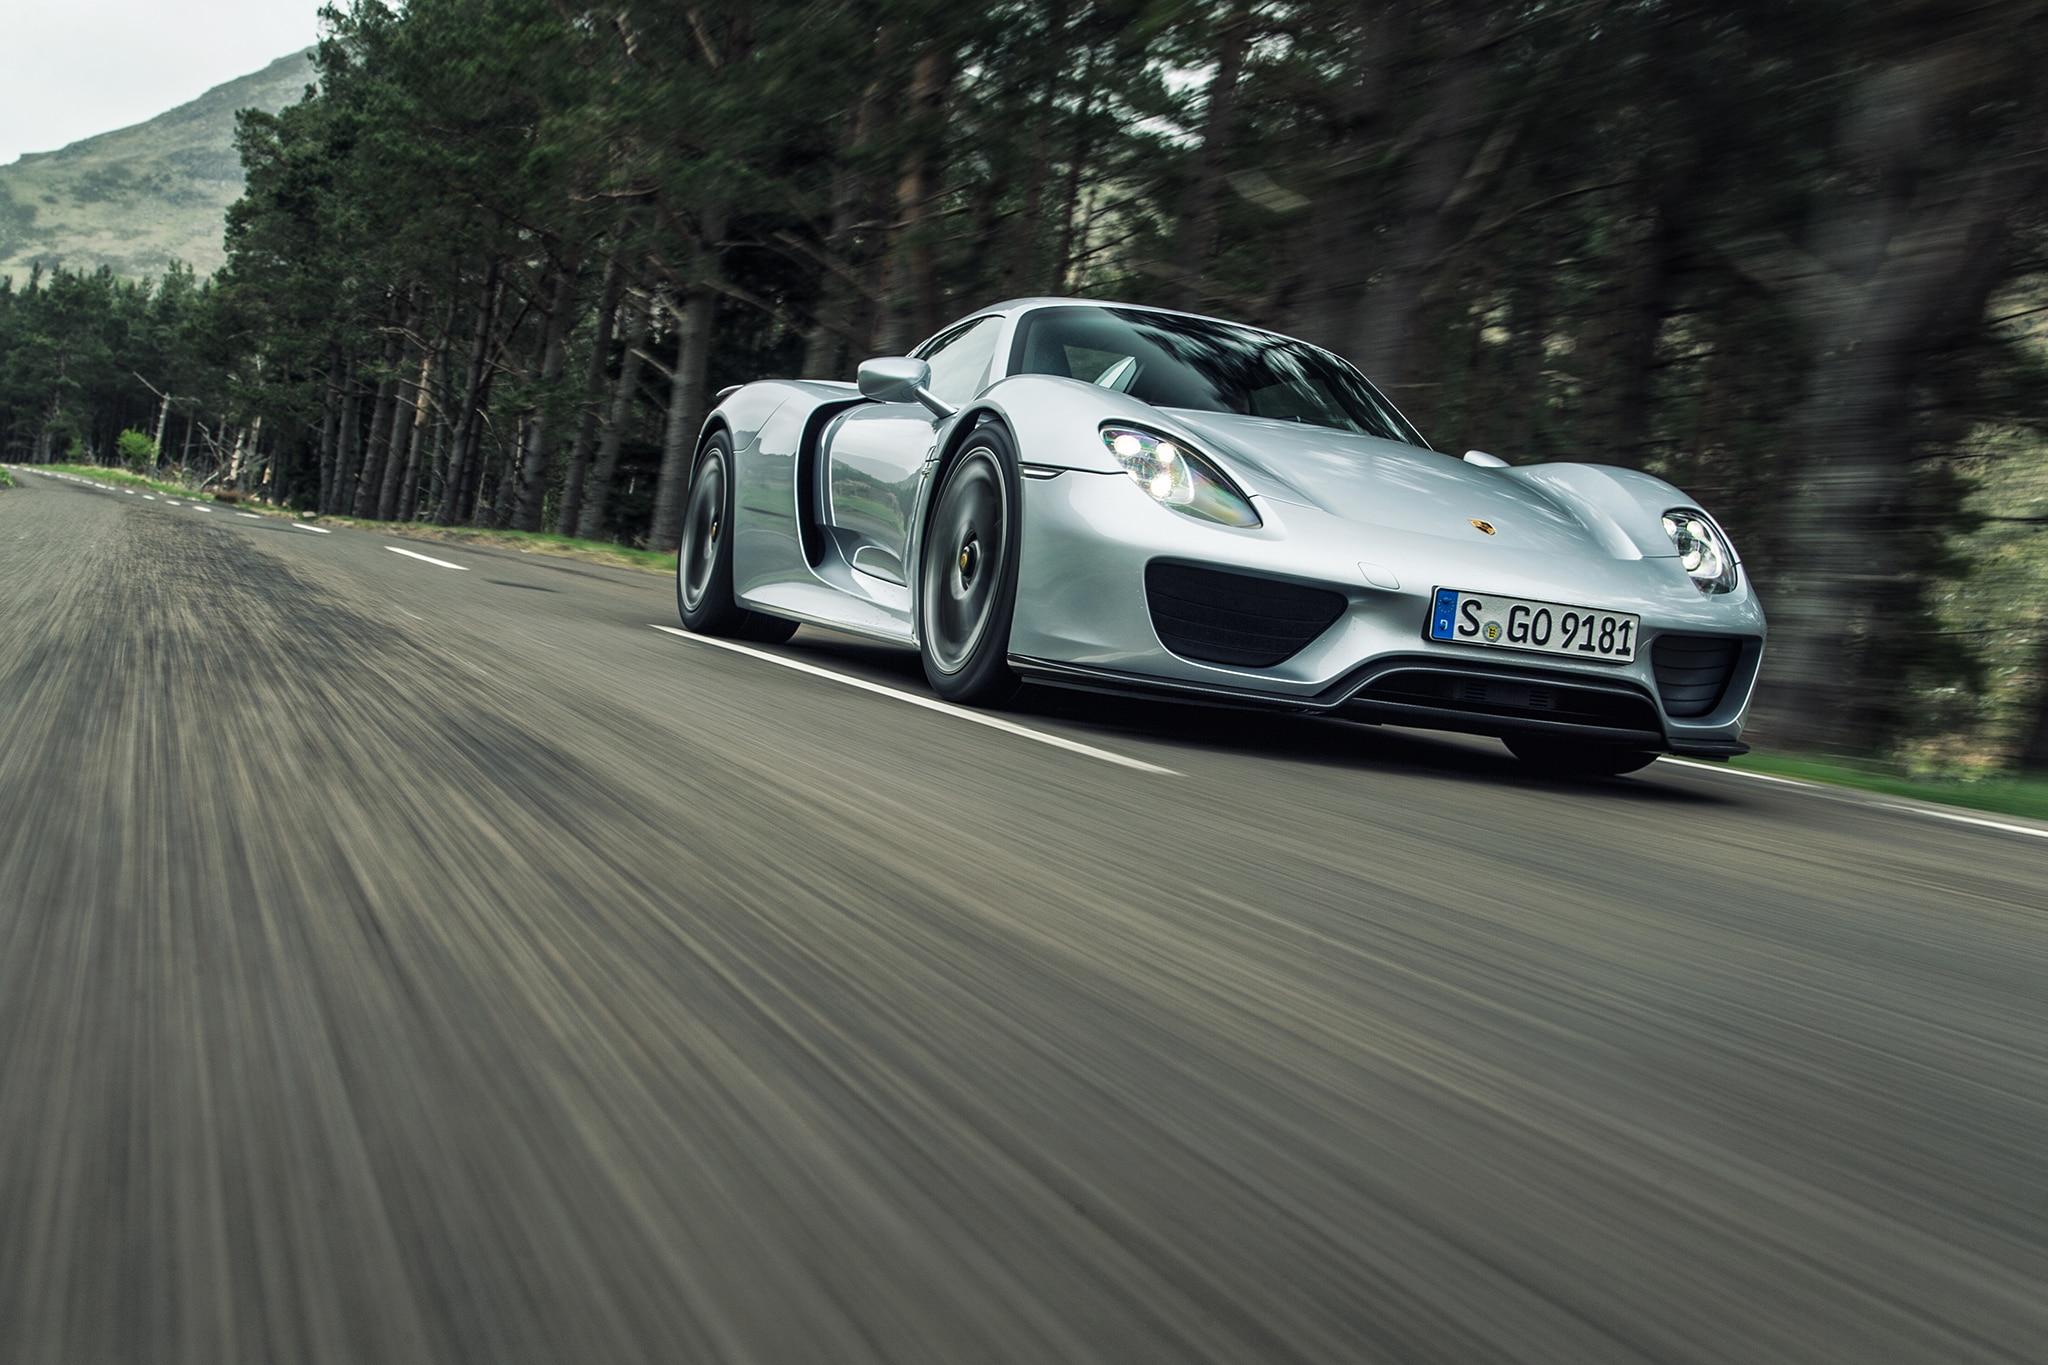 2016-Porsche-918-Spyder-front-three-quarter-in-motion-04 Remarkable Porsche 918 Spyder On the Road Cars Trend